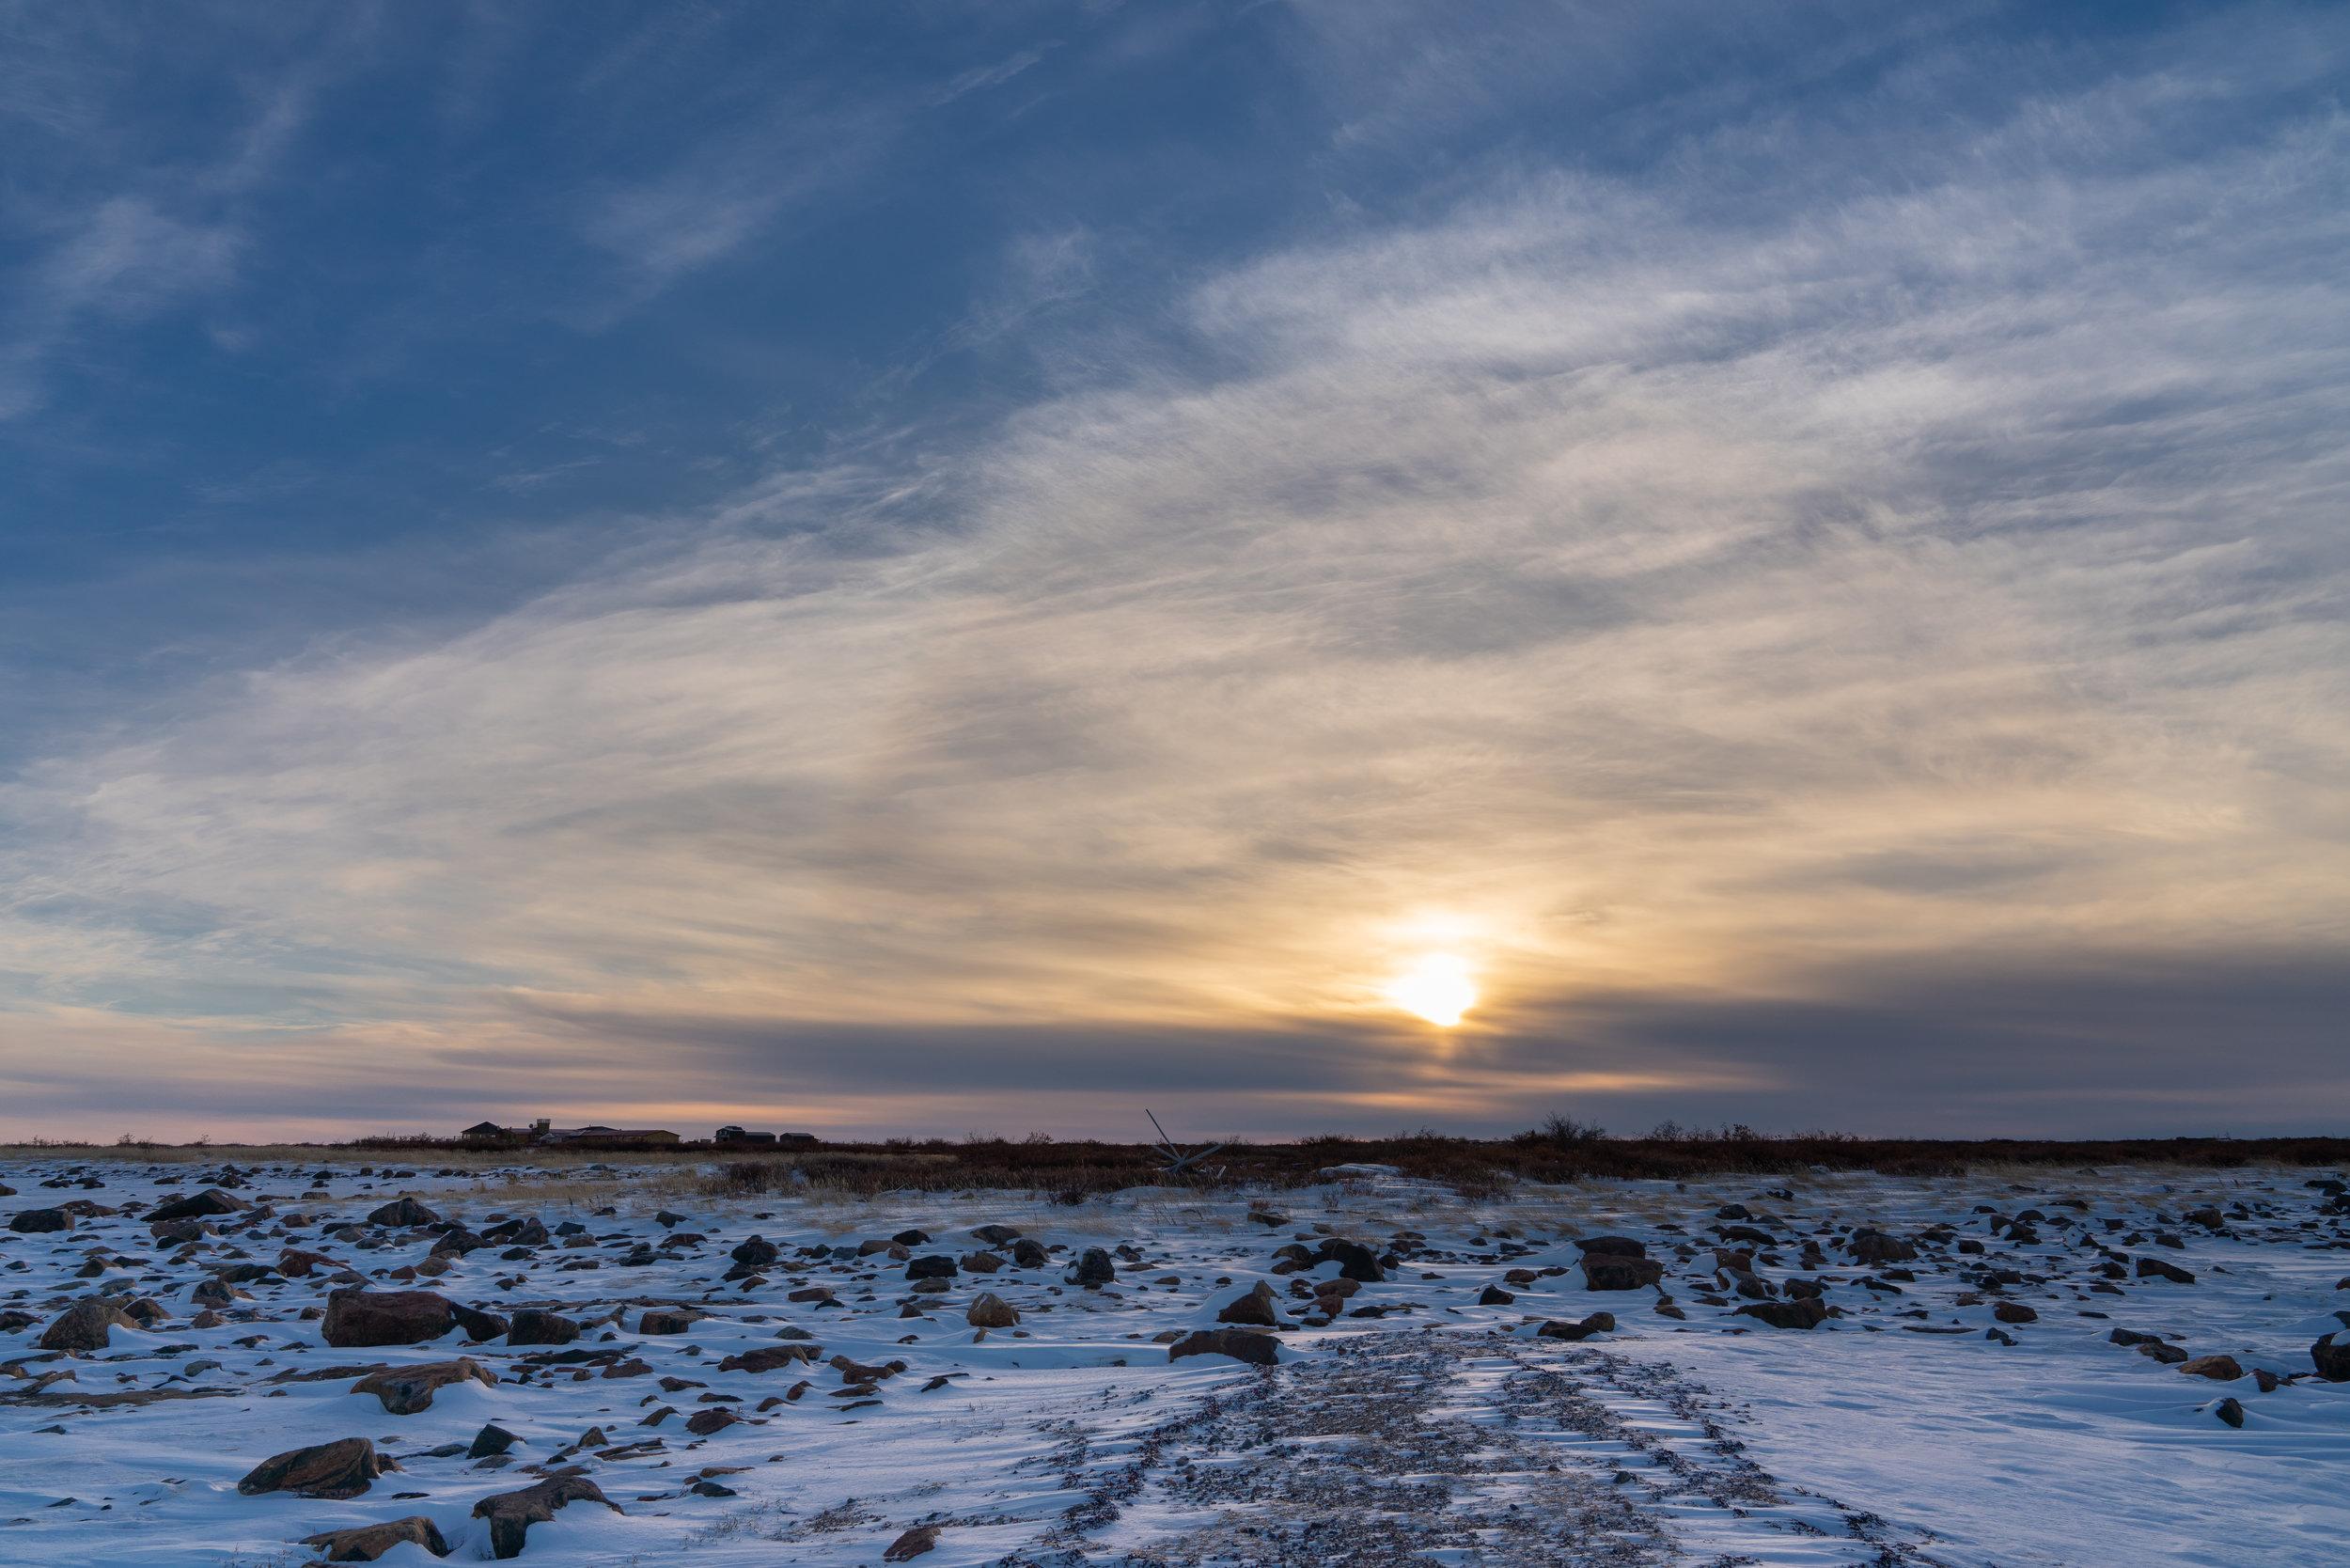 Sunset @ Seal River